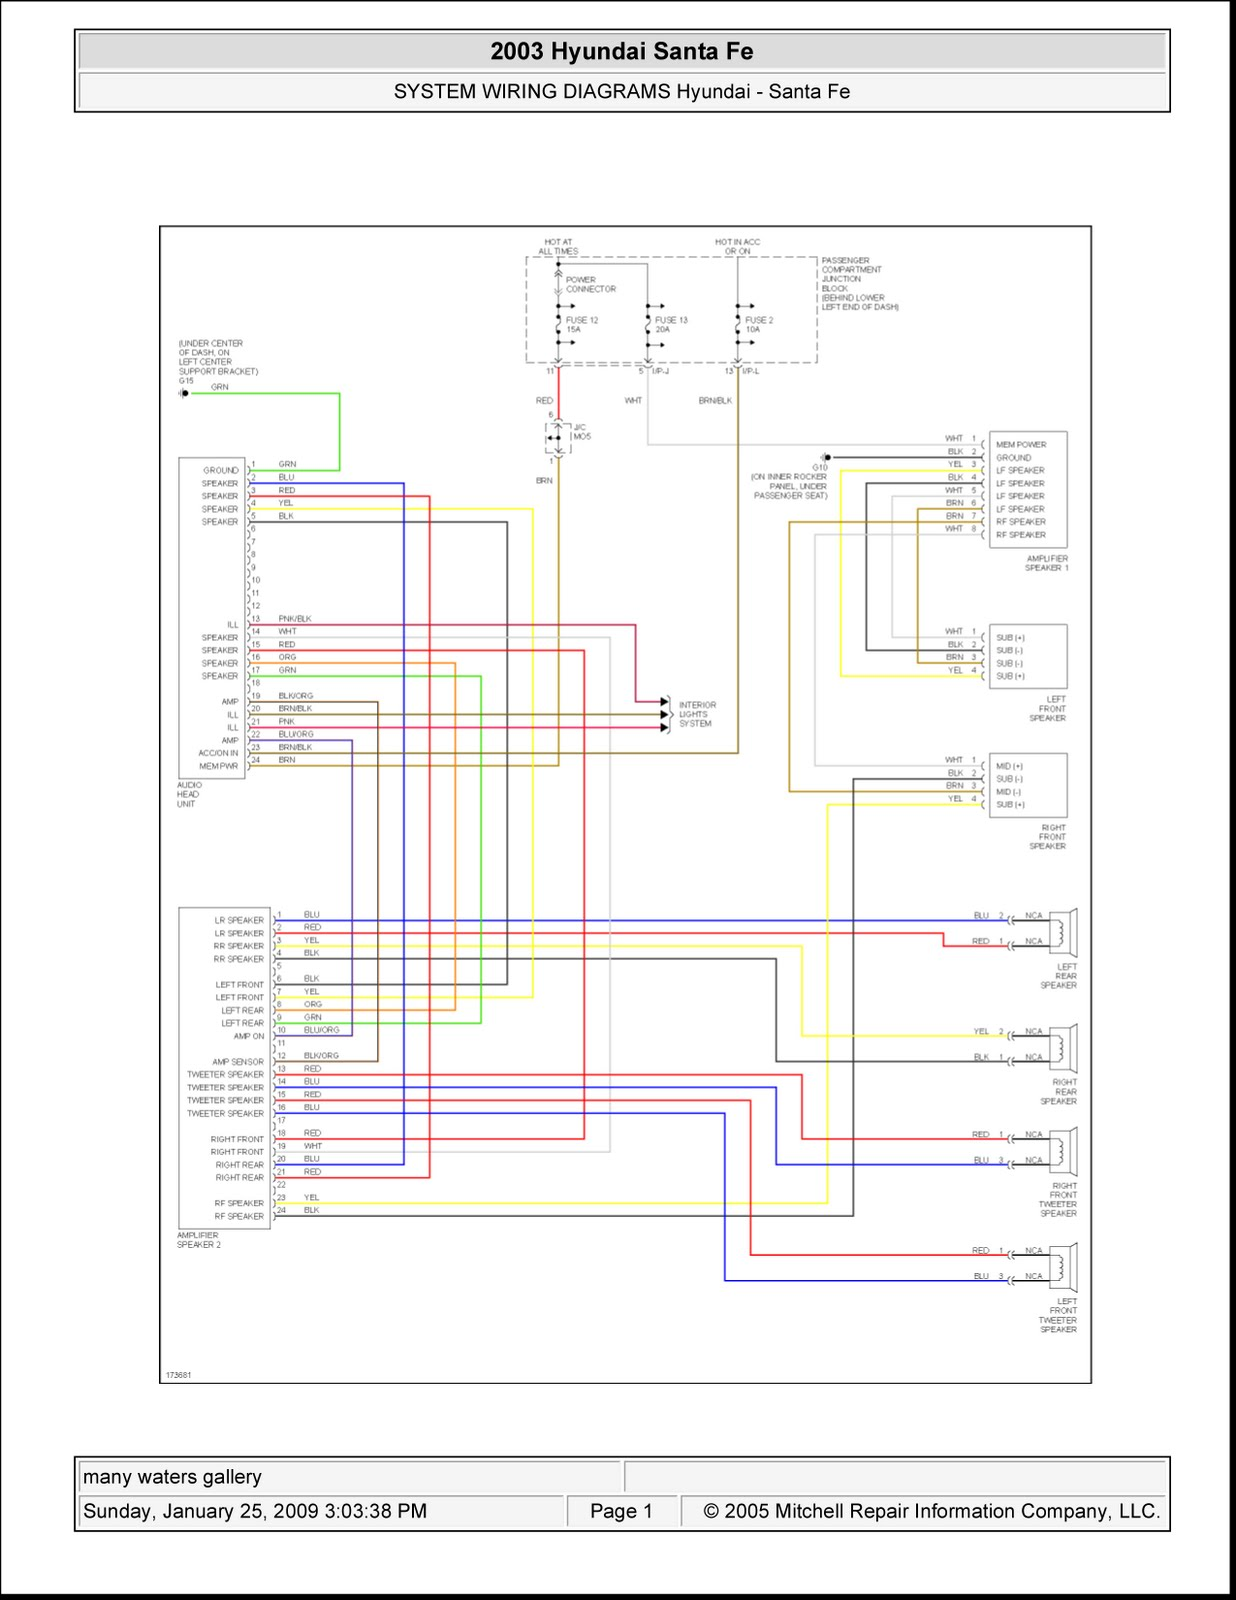 2003 Hyundai Santa Fe | System Wiring Diagrams | Radio Circuits | Schematic Wiring Diagrams